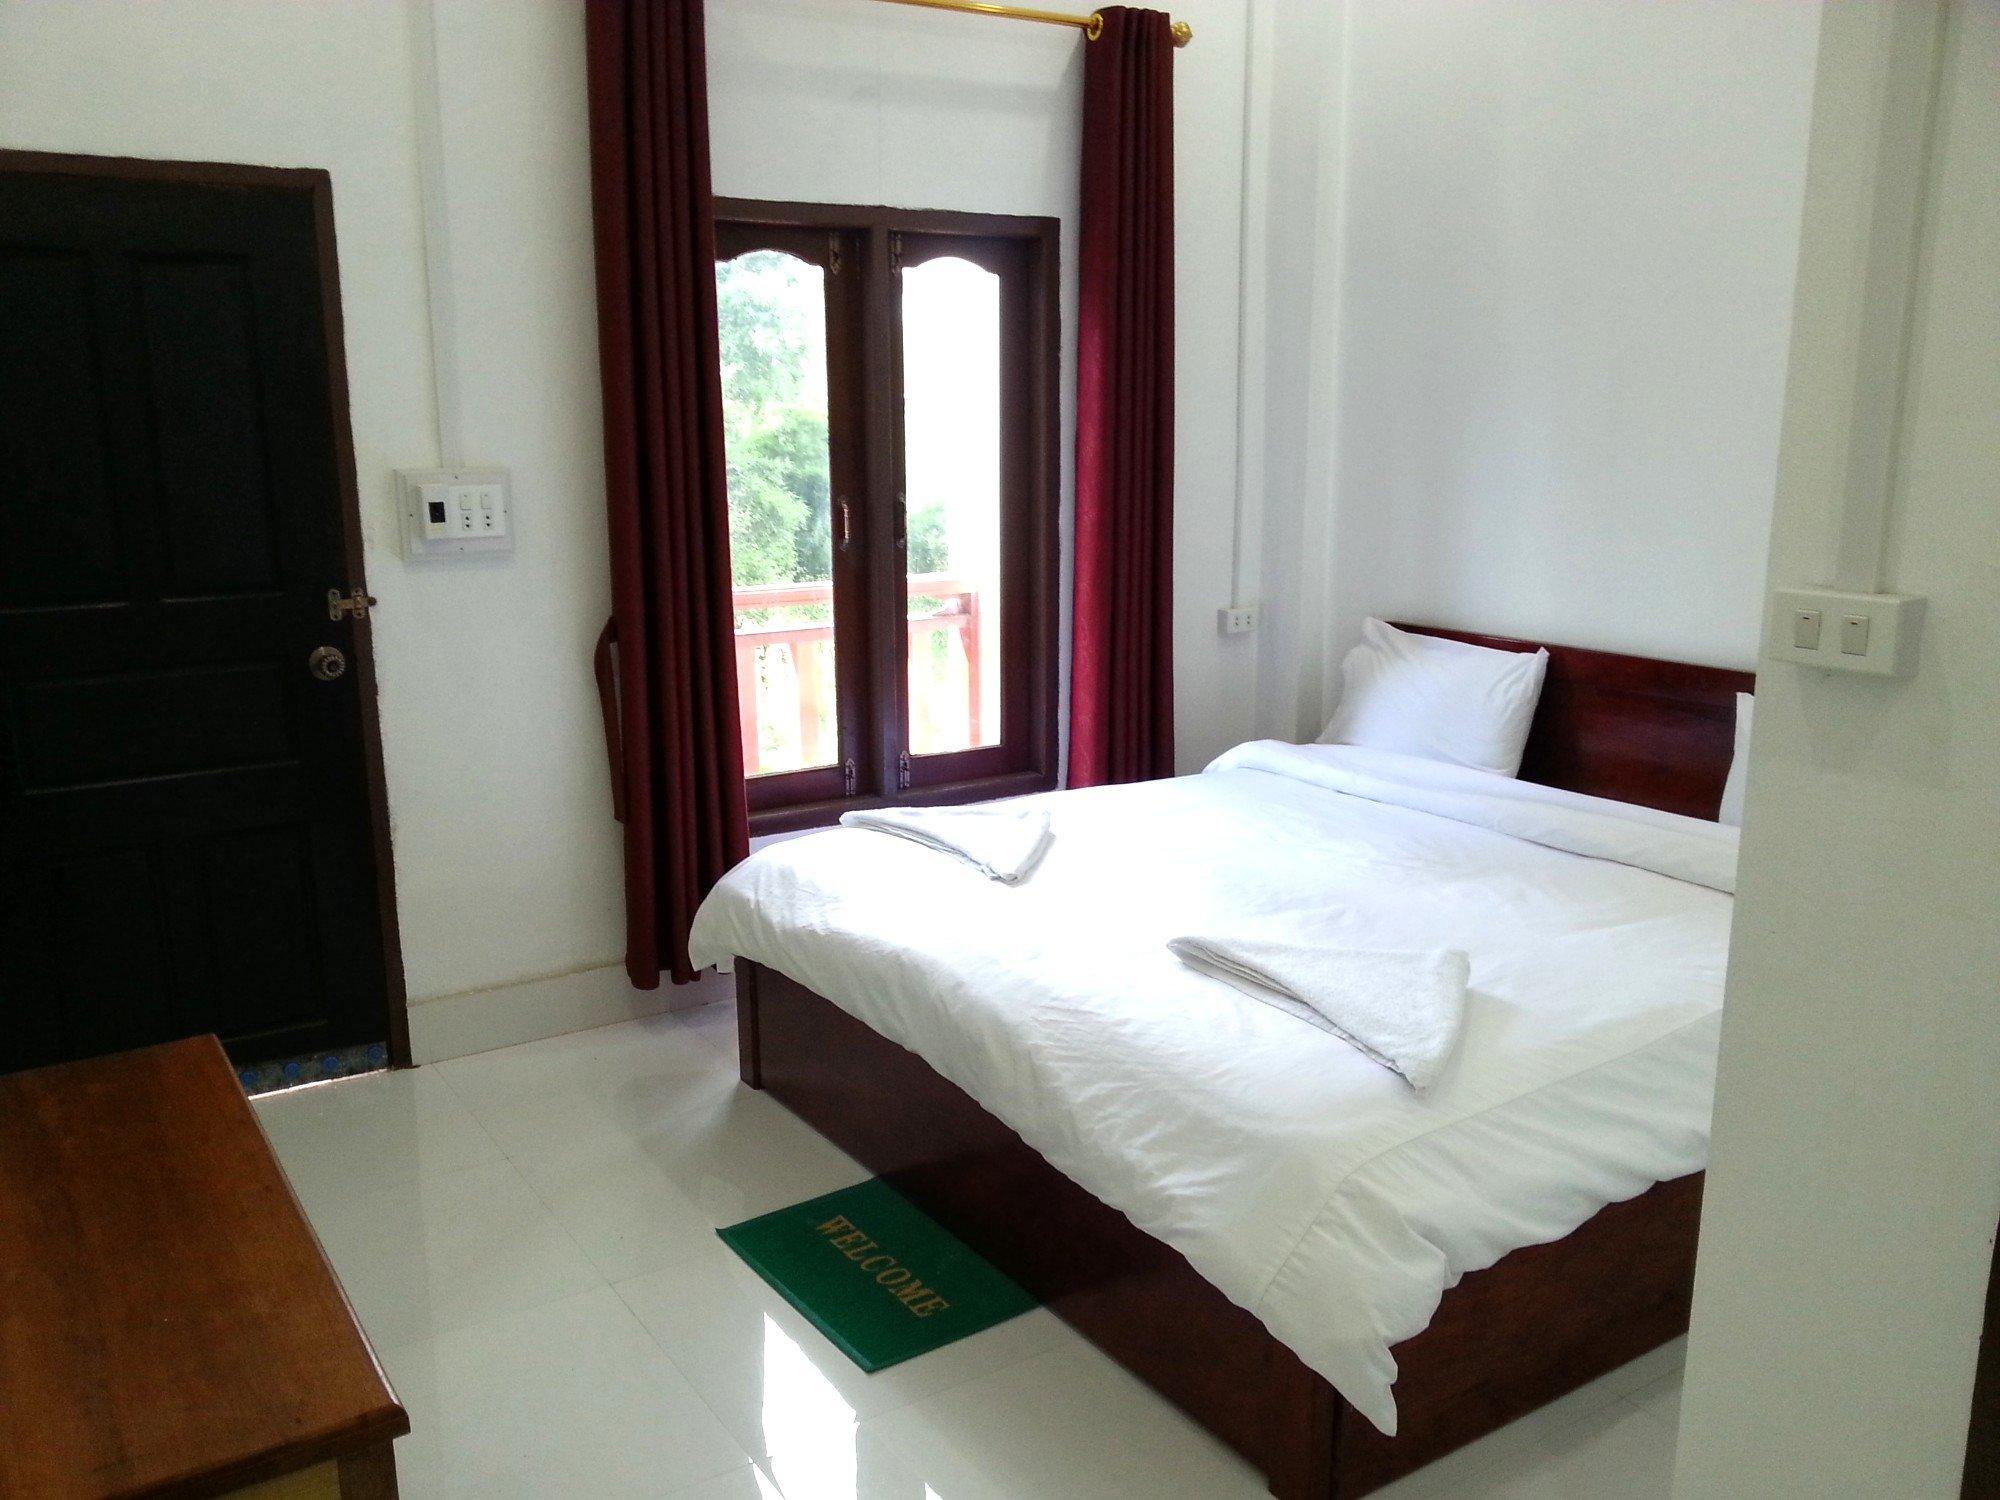 Bedroom at Sipanya Guesthouse